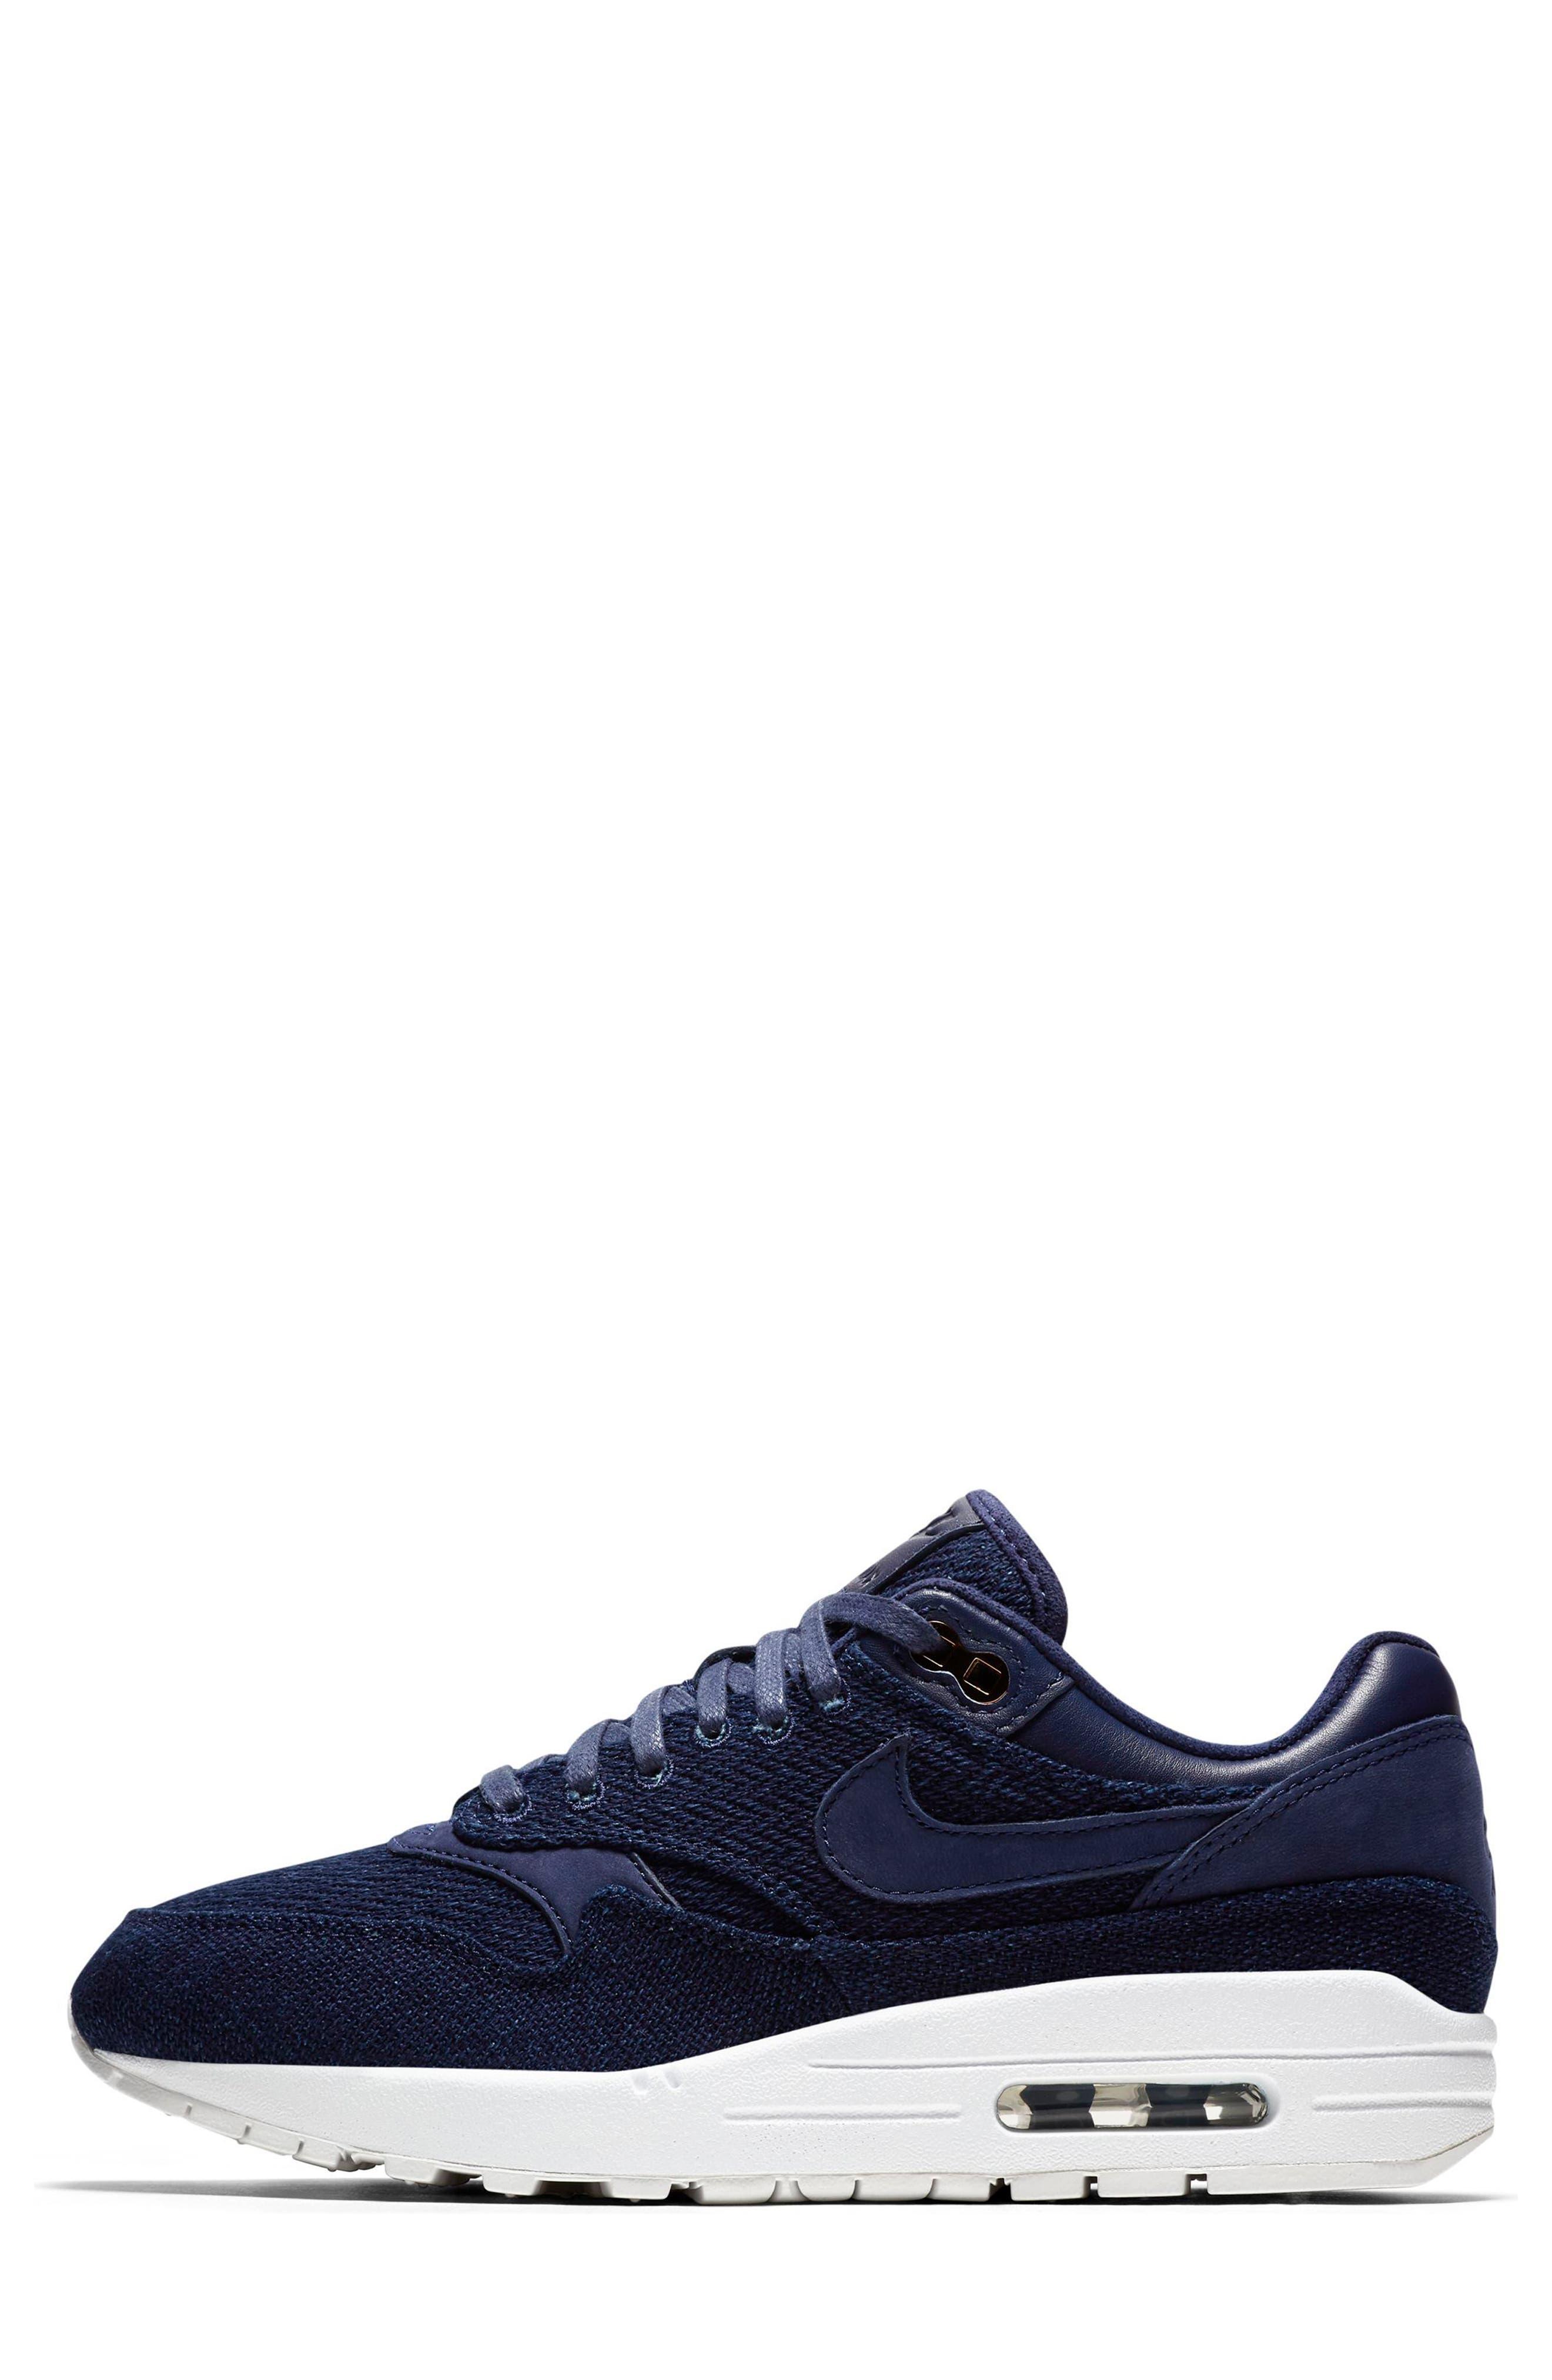 Alternate Image 3  - Nike Air Max 1 Lux Sneaker (Women)